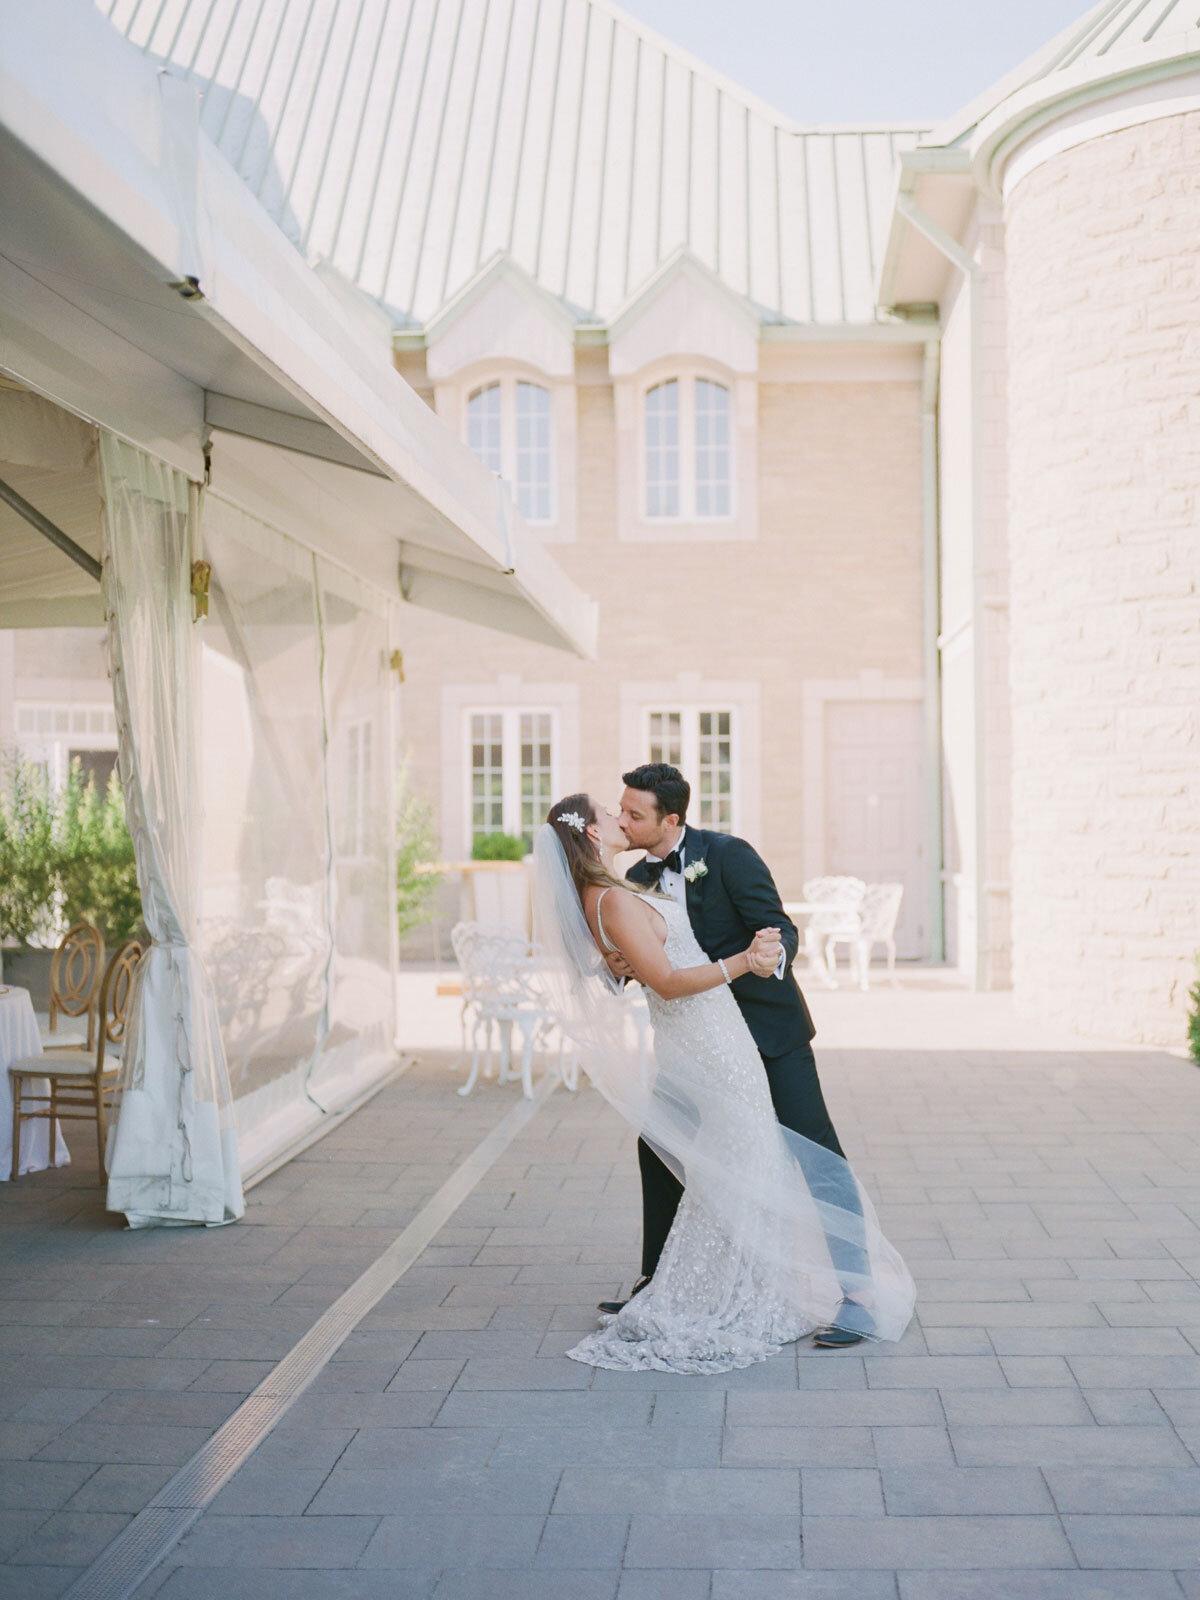 Chateau-des-Charmes-Wedding-Summer-Vineyard-Bride-Niagara-on-the-Lake-photos-by-Gemini-Photography-Ontario-0044.jpg